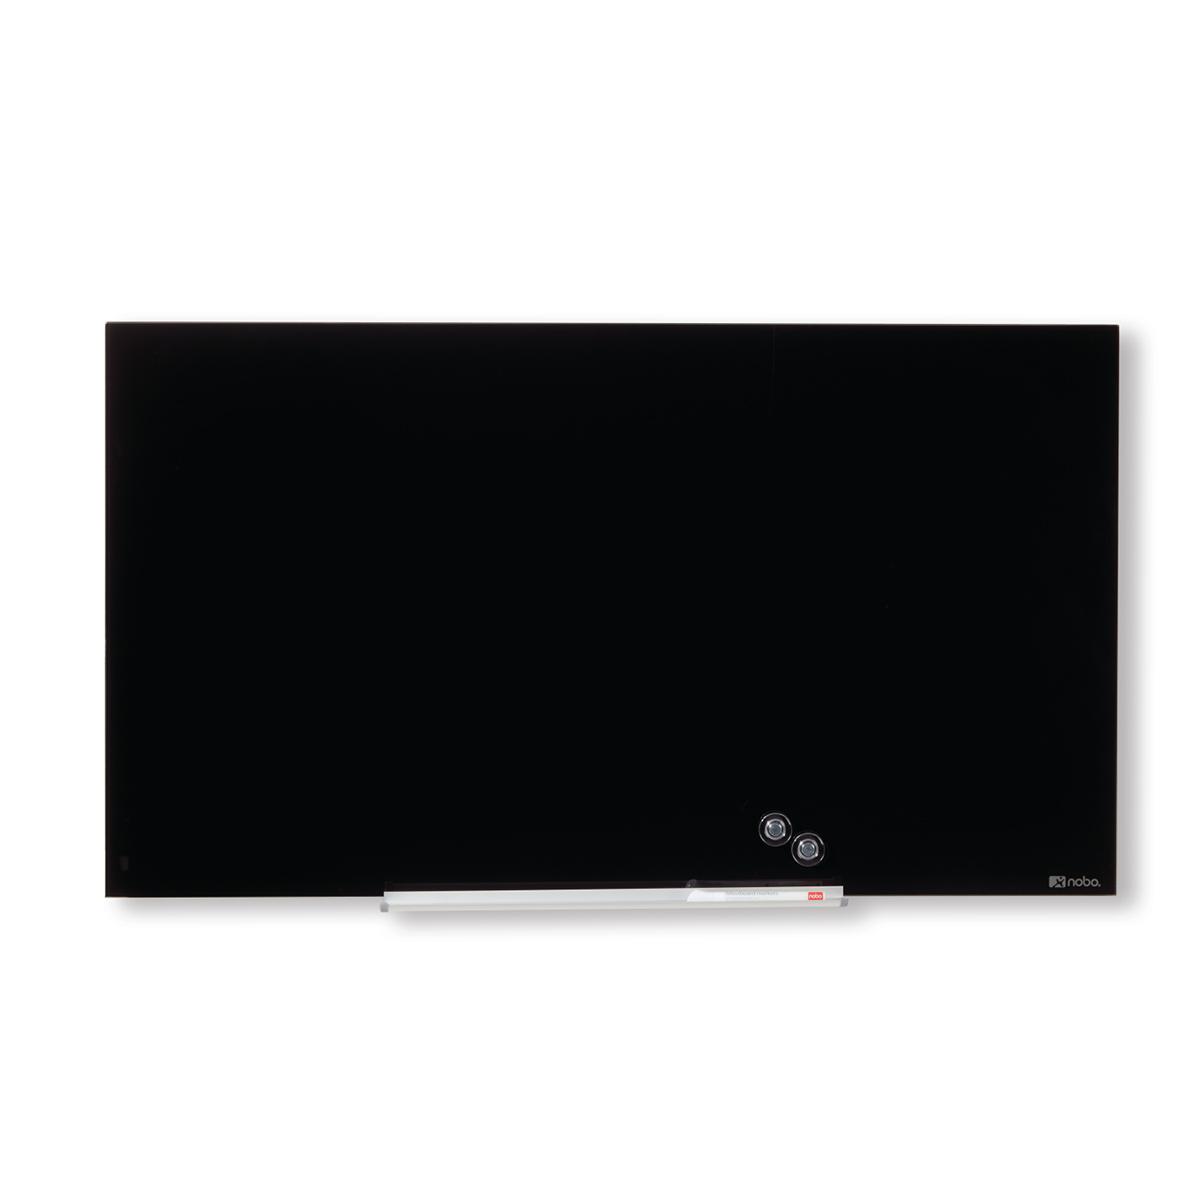 Nobo 1905181 Black Diamond Glass Whiteboard 1264 x 711mm